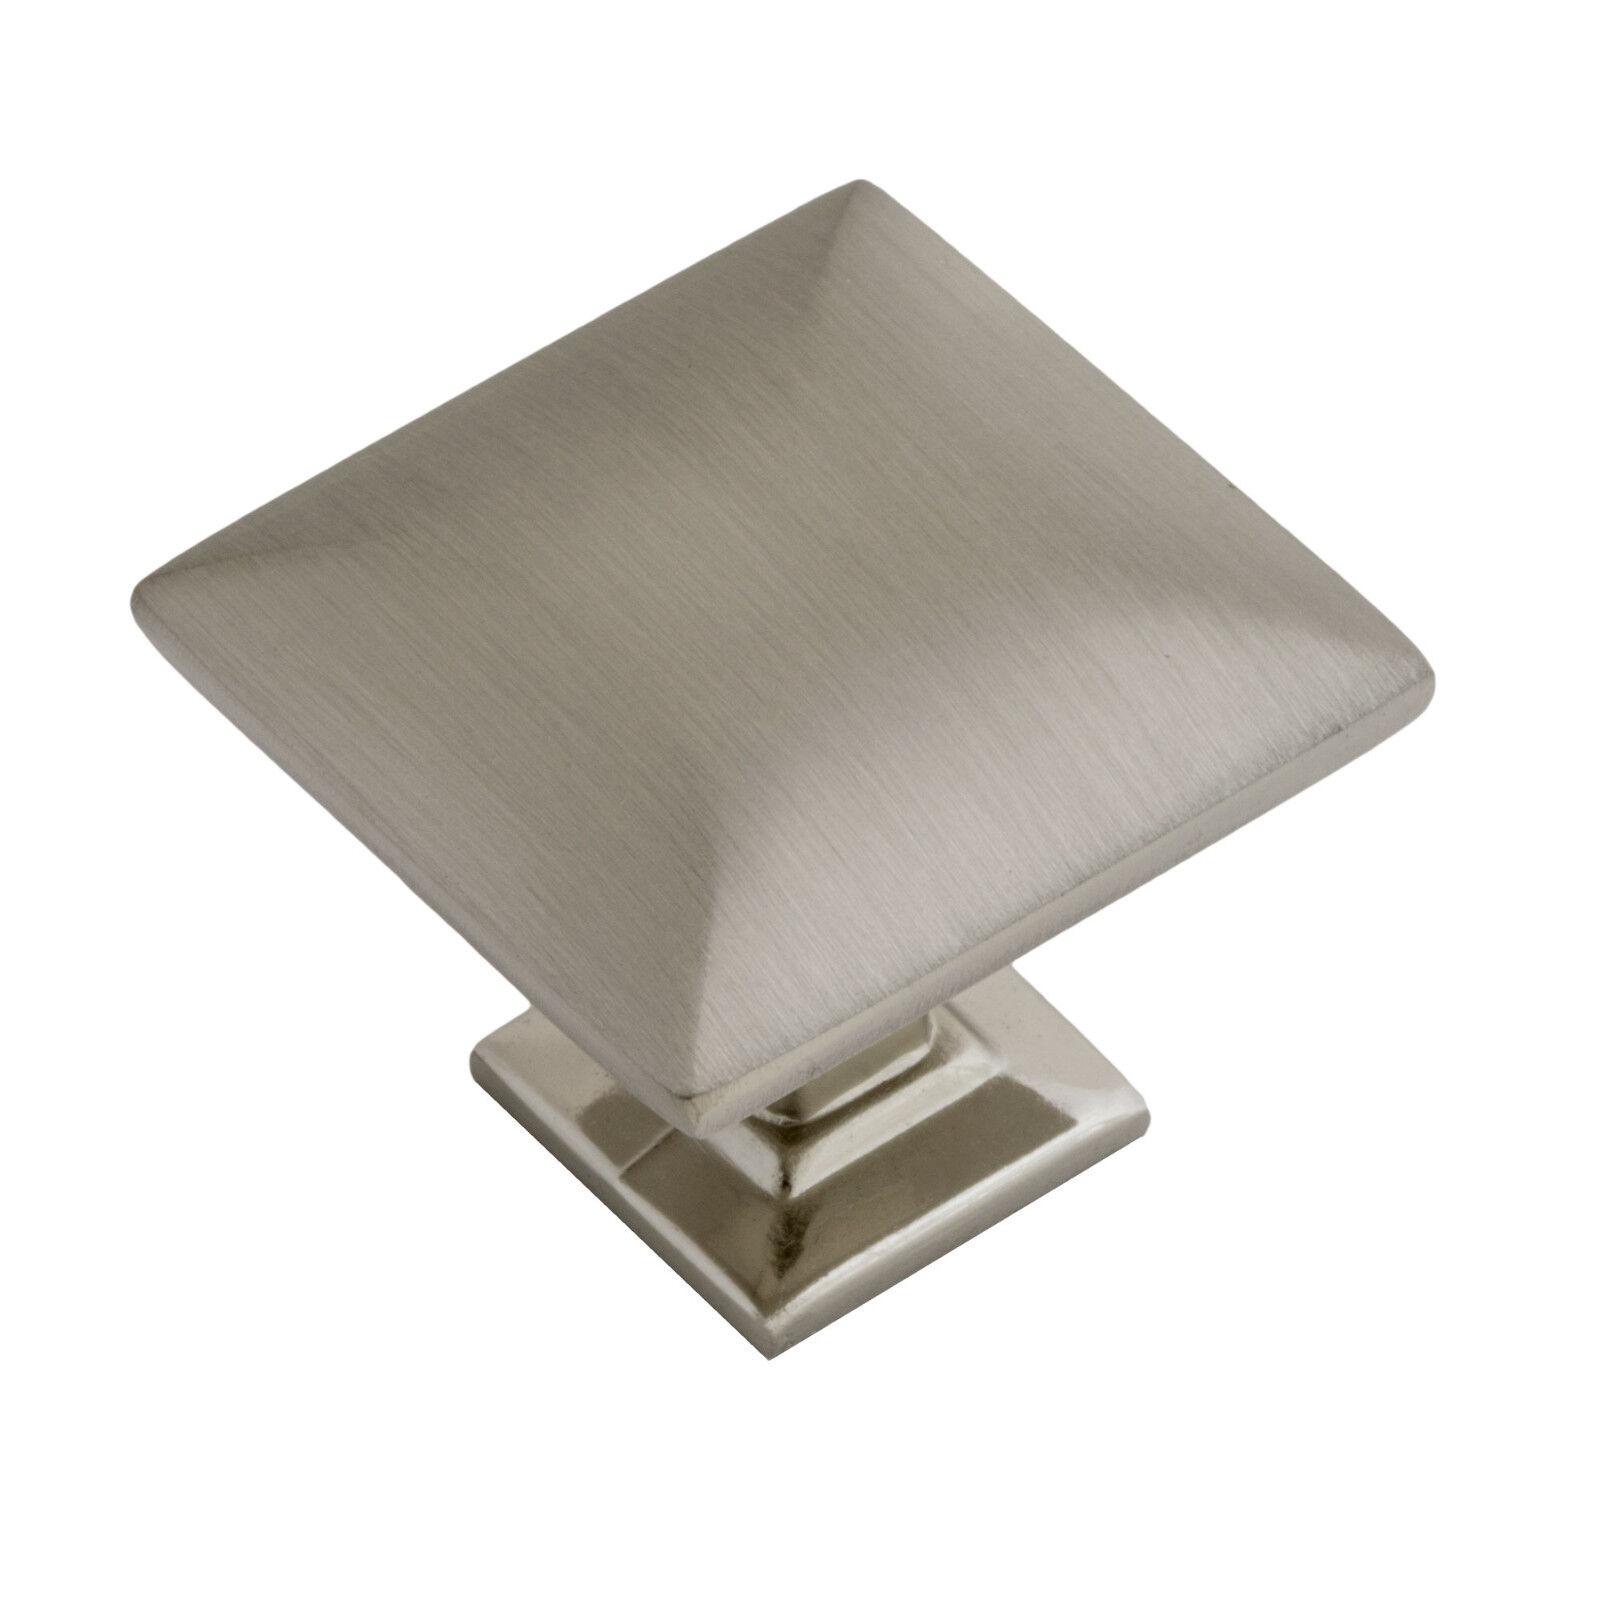 Modern Pyramid Square Kitchen Cabinet Hardware Knob 1 1/4″, Satin Nickel Building & Hardware